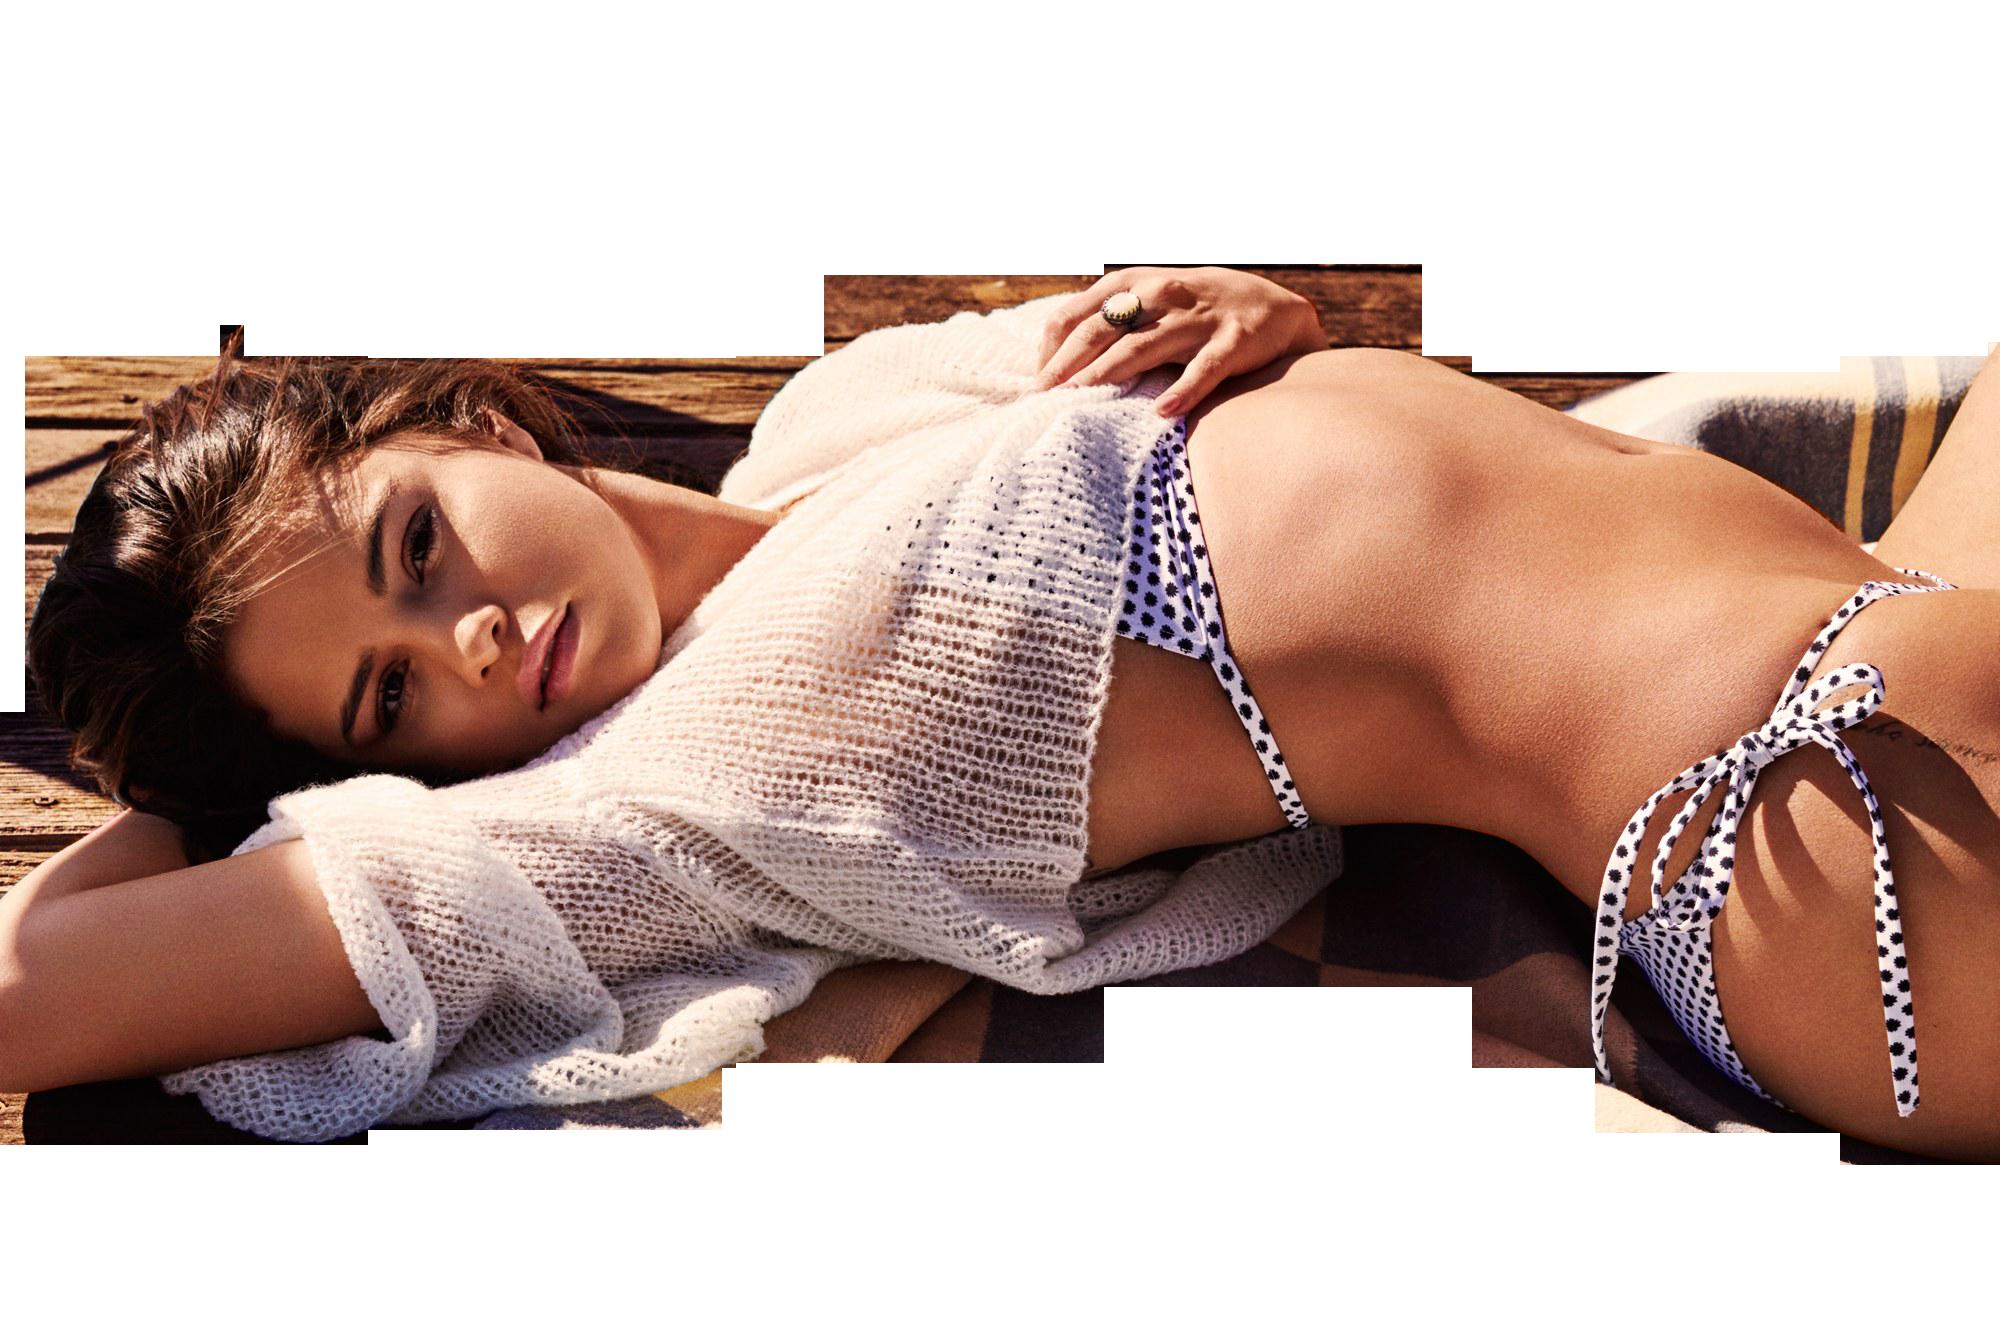 Selena gomez bikini clipart svg library download Selena Gomez in Bikini Hot PNG Image - PurePNG | Free ... svg library download